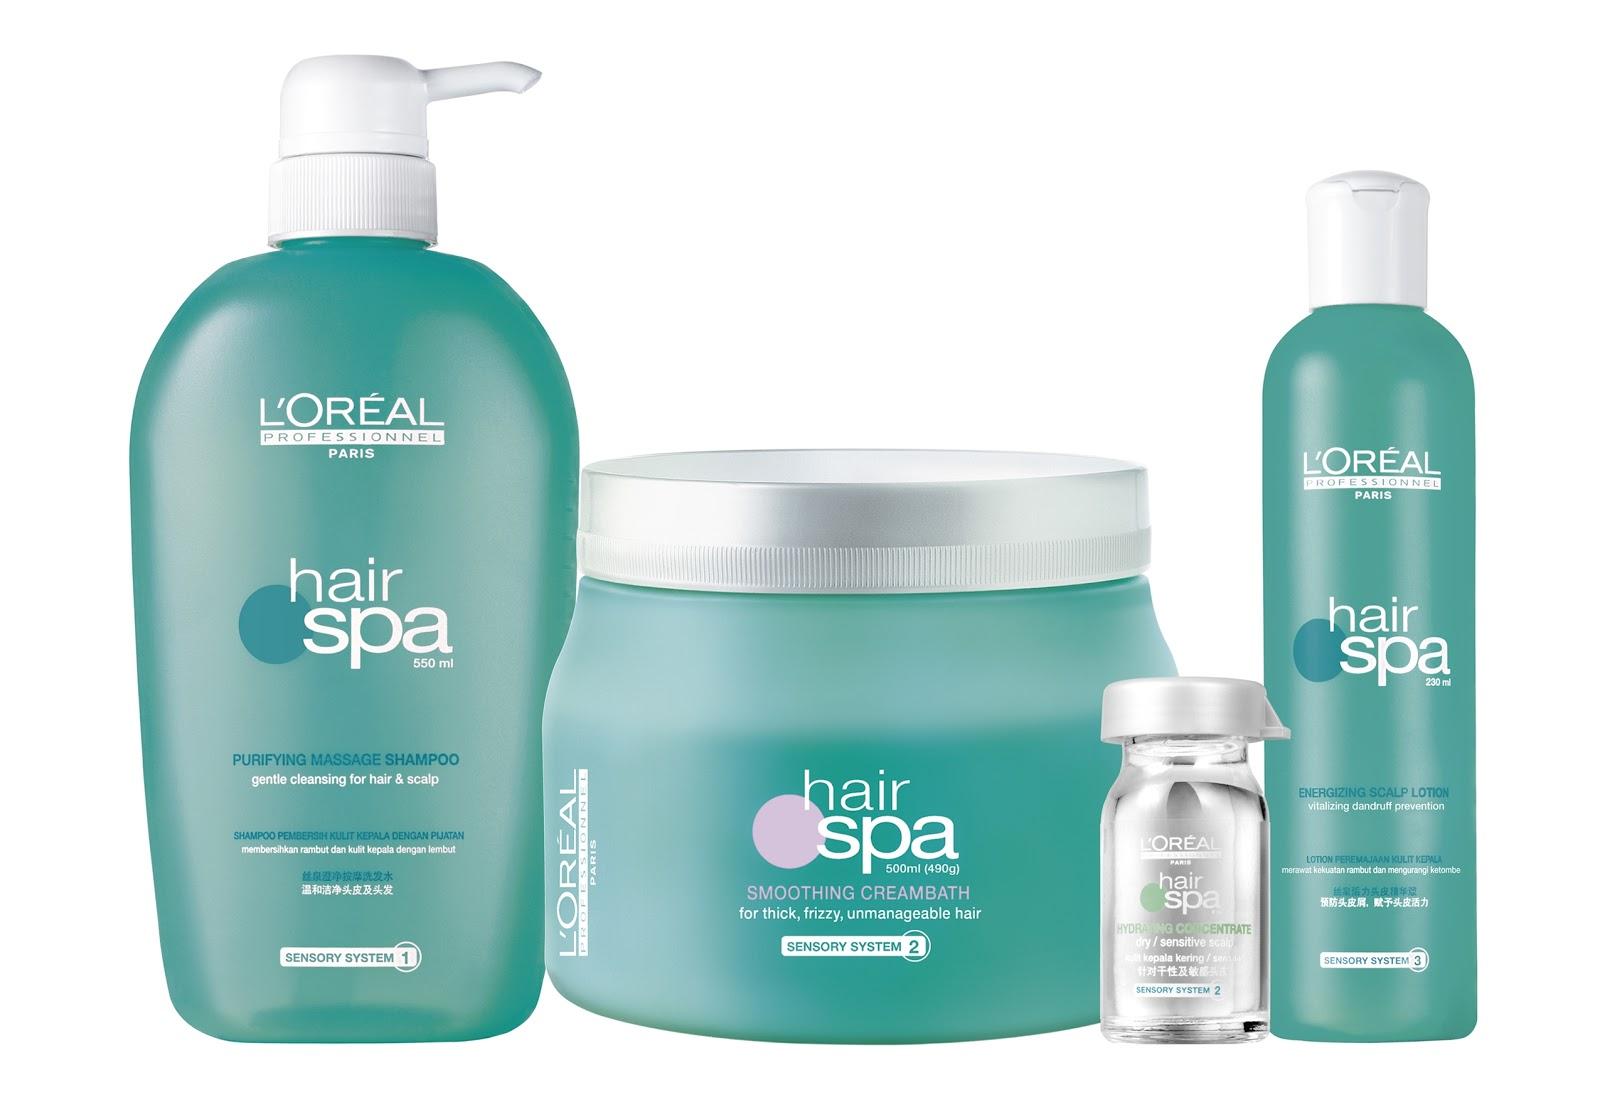 L'Oreal Professionnel Hair Spa Treatment Info - New Love ...